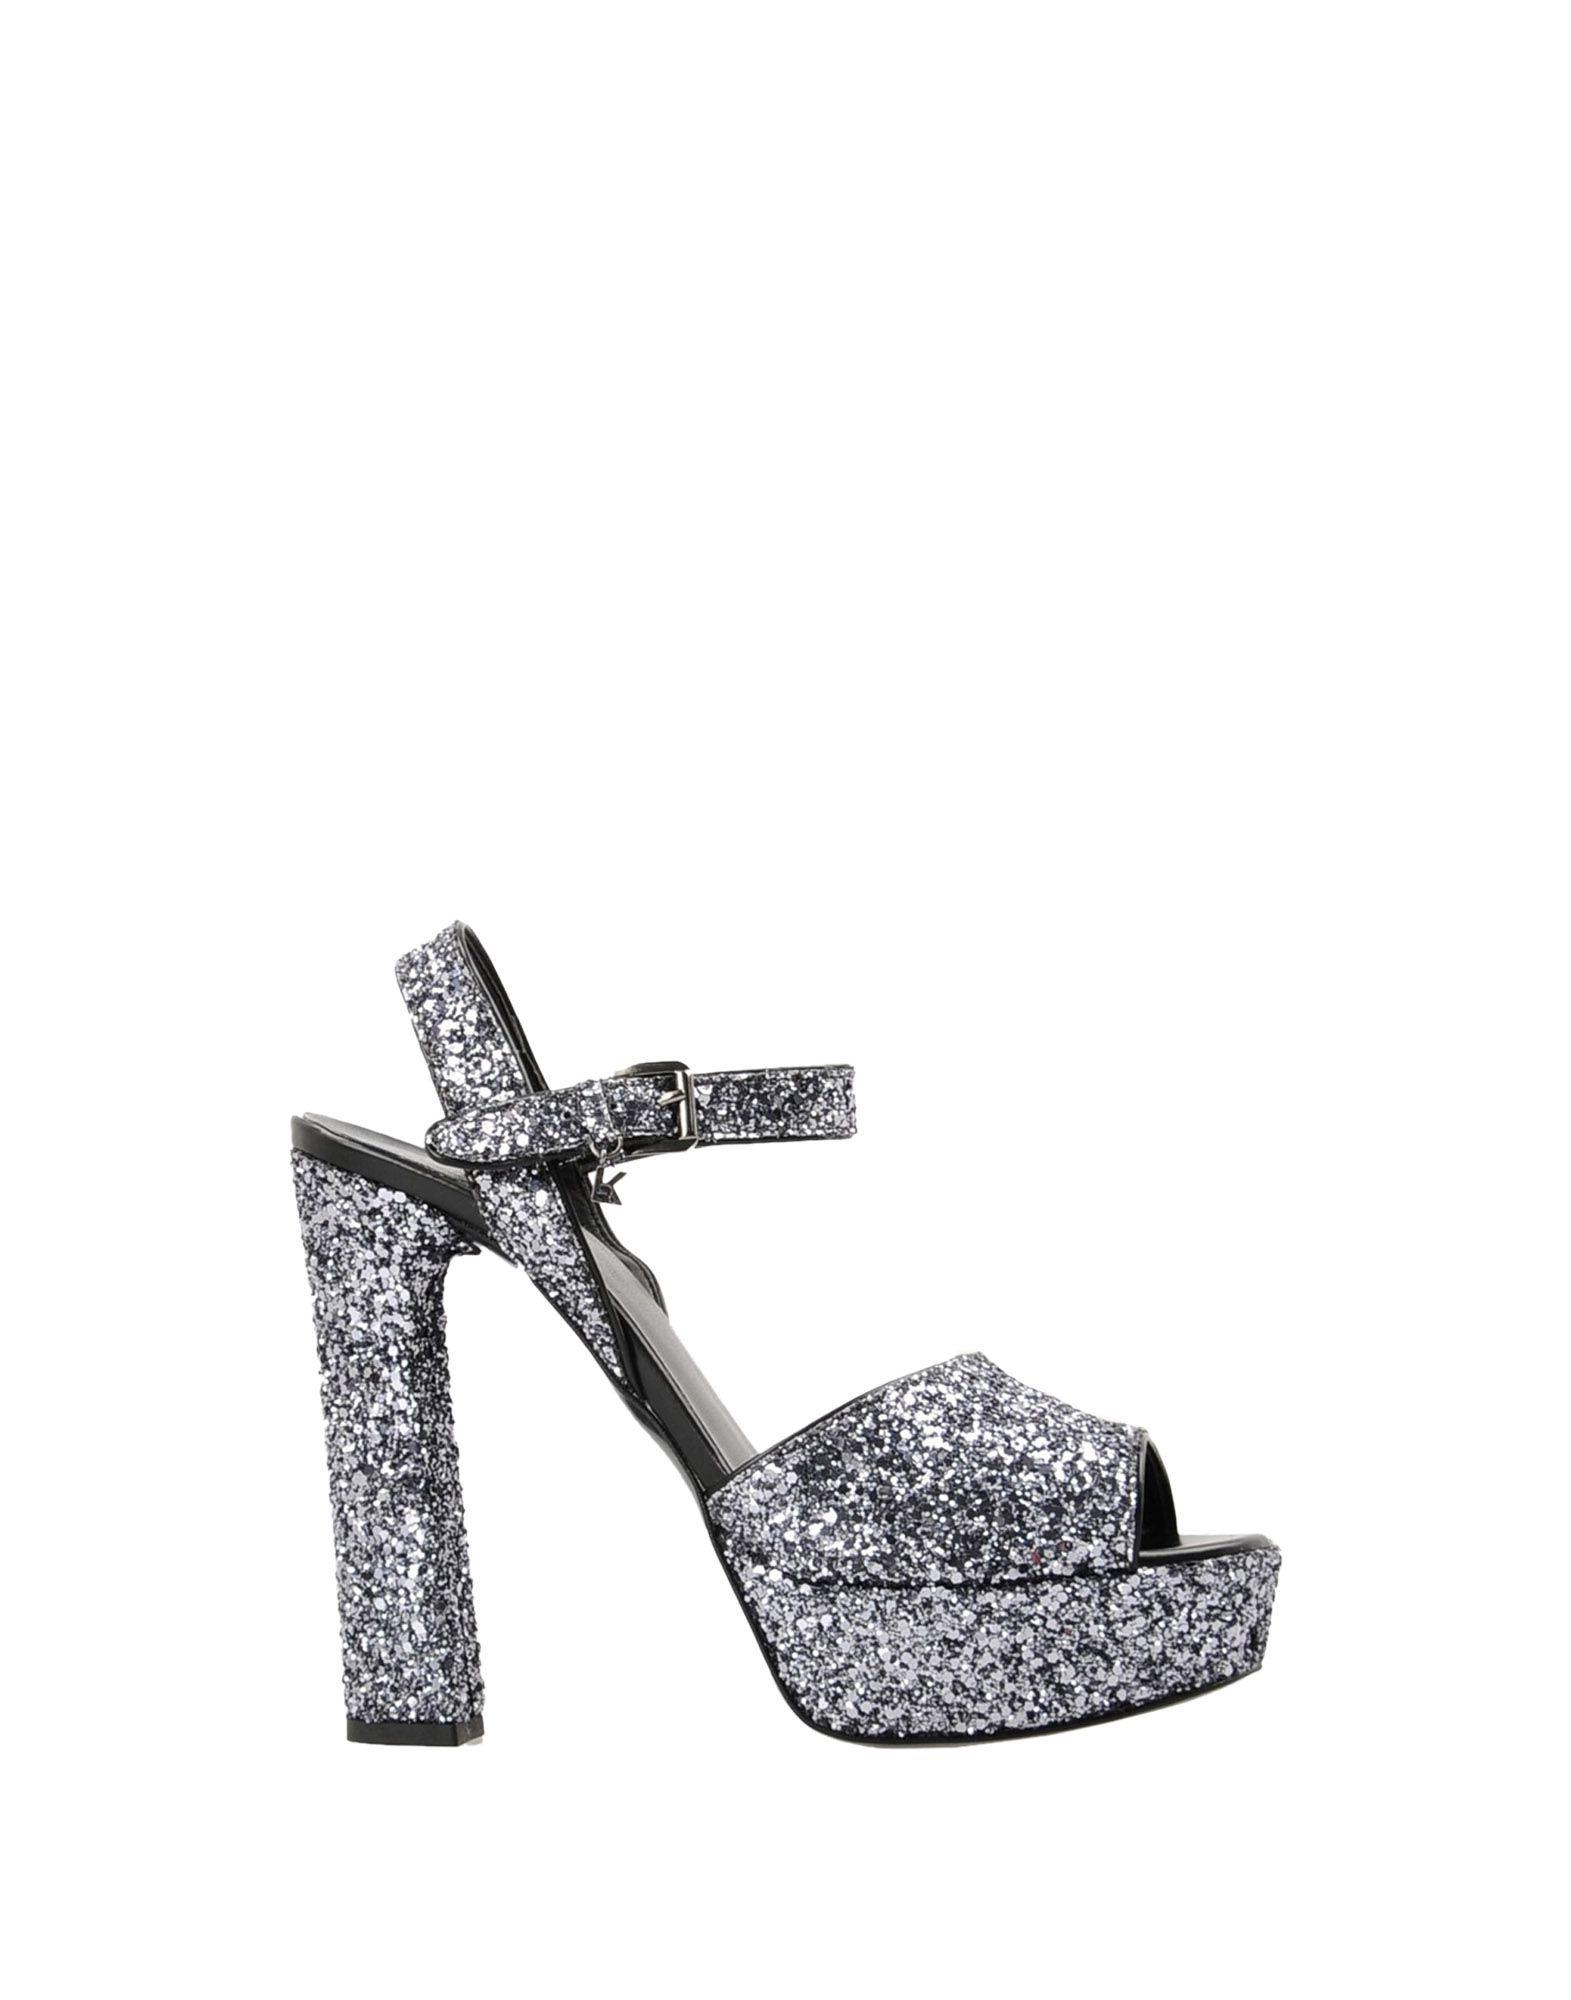 ... Sandales Karl Lagerfeld Soiree Open Sandal Glitter - Femme - Sandales  Karl Lagerfeld sur ...